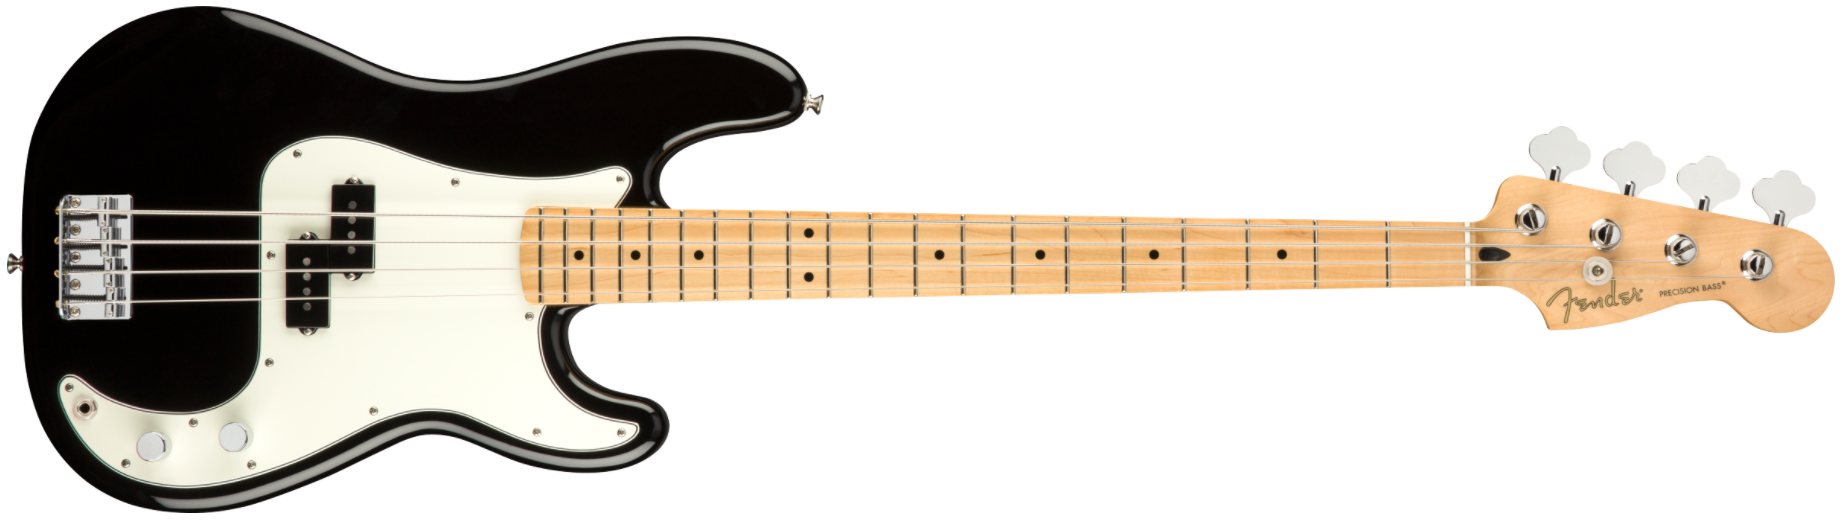 Fender Player P-Bass, MN, Black